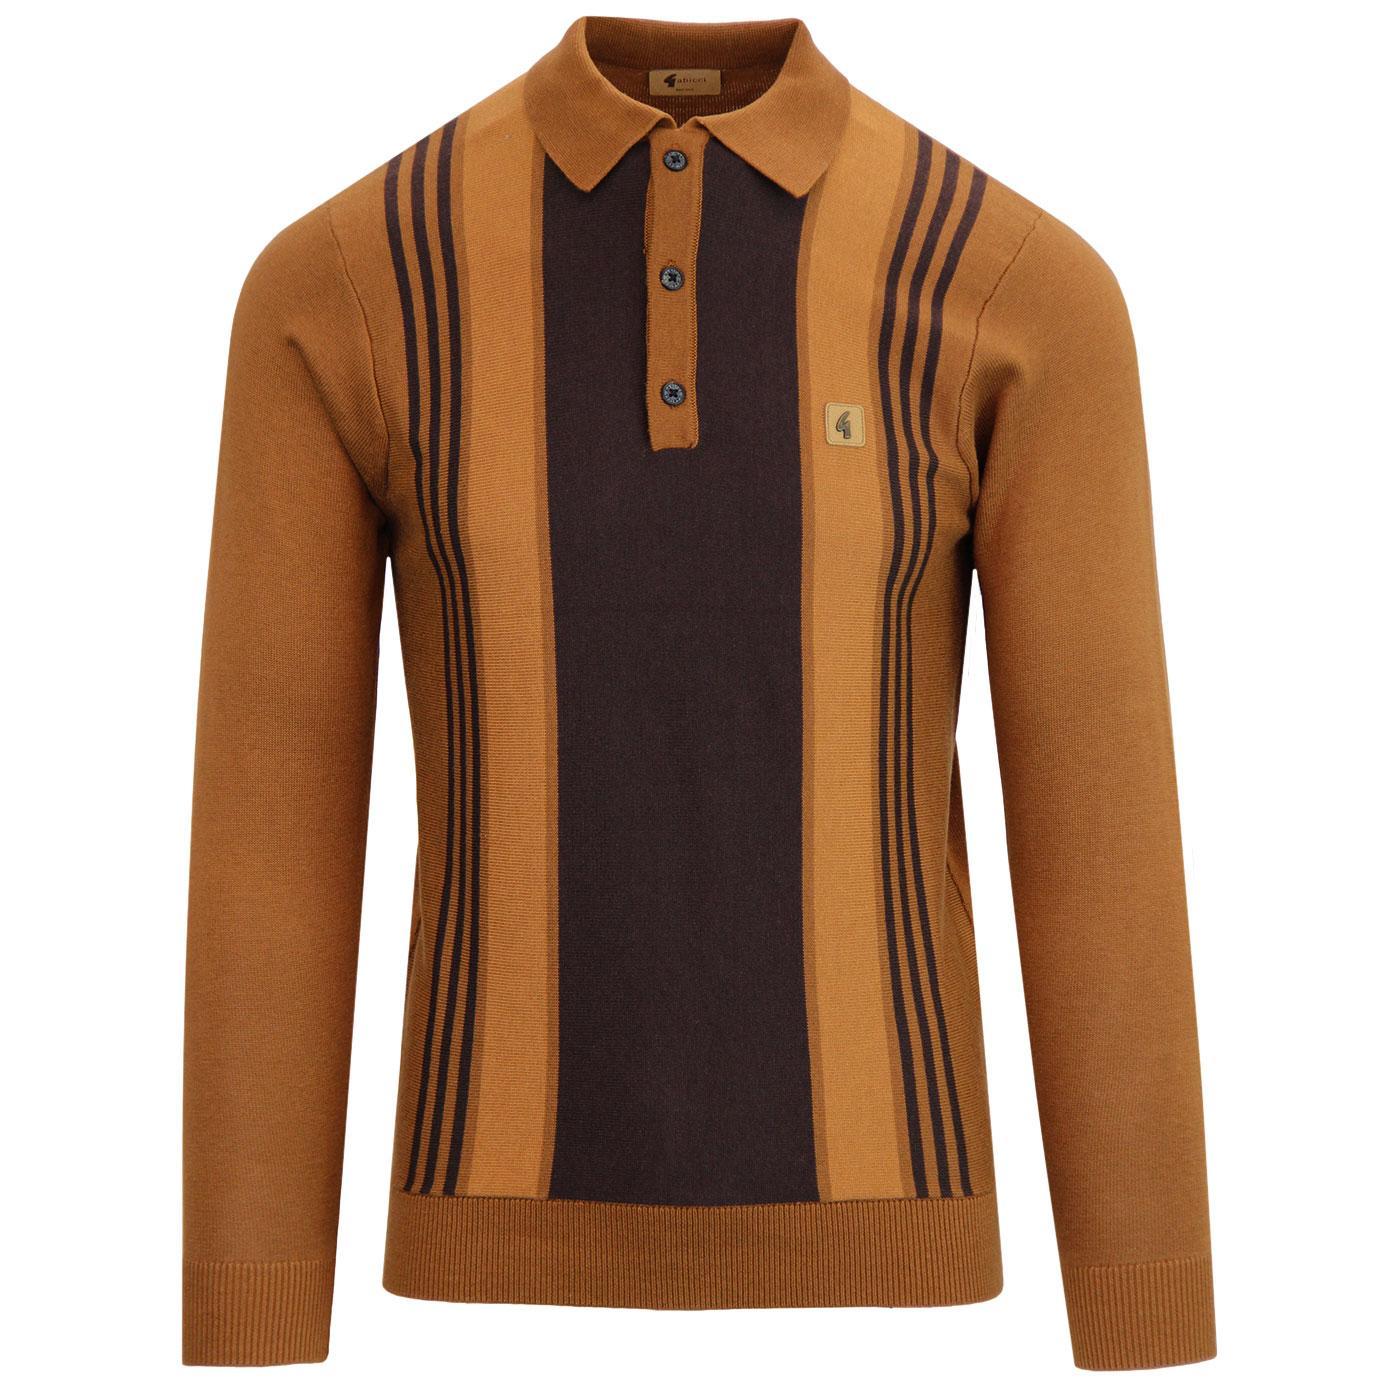 Searle GABICCI VINTAGE Mod Stripe Knit Polo TOFFEE